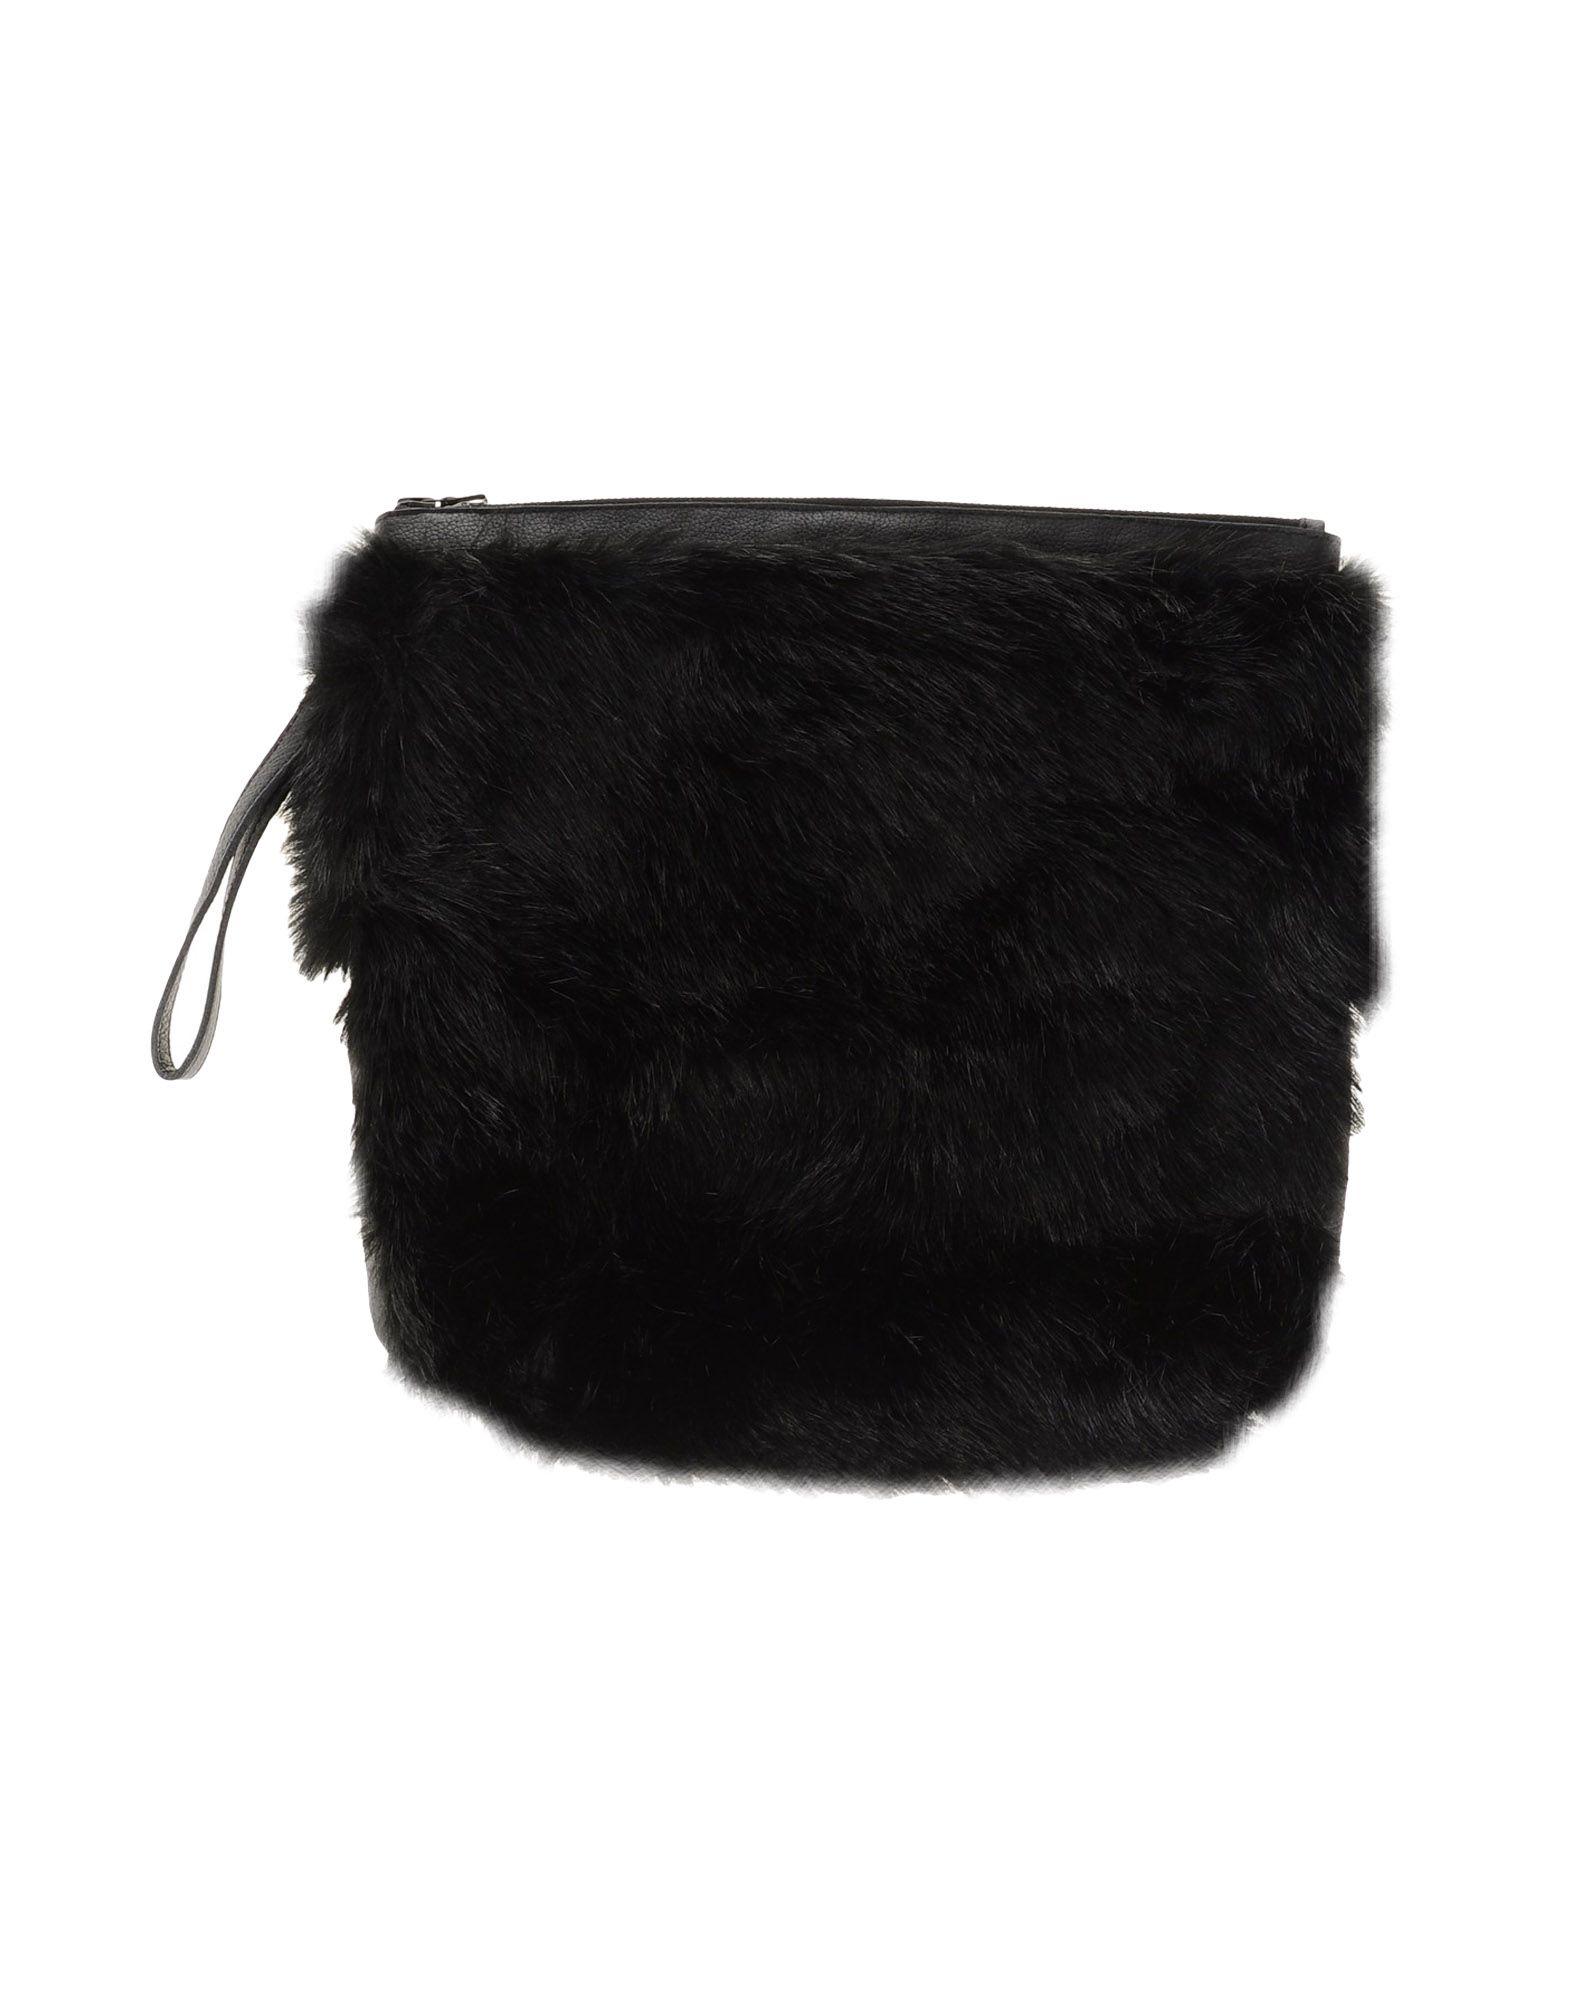 d2a2a4acfc0 Christopher Raeburn Handbag in Black - Lyst